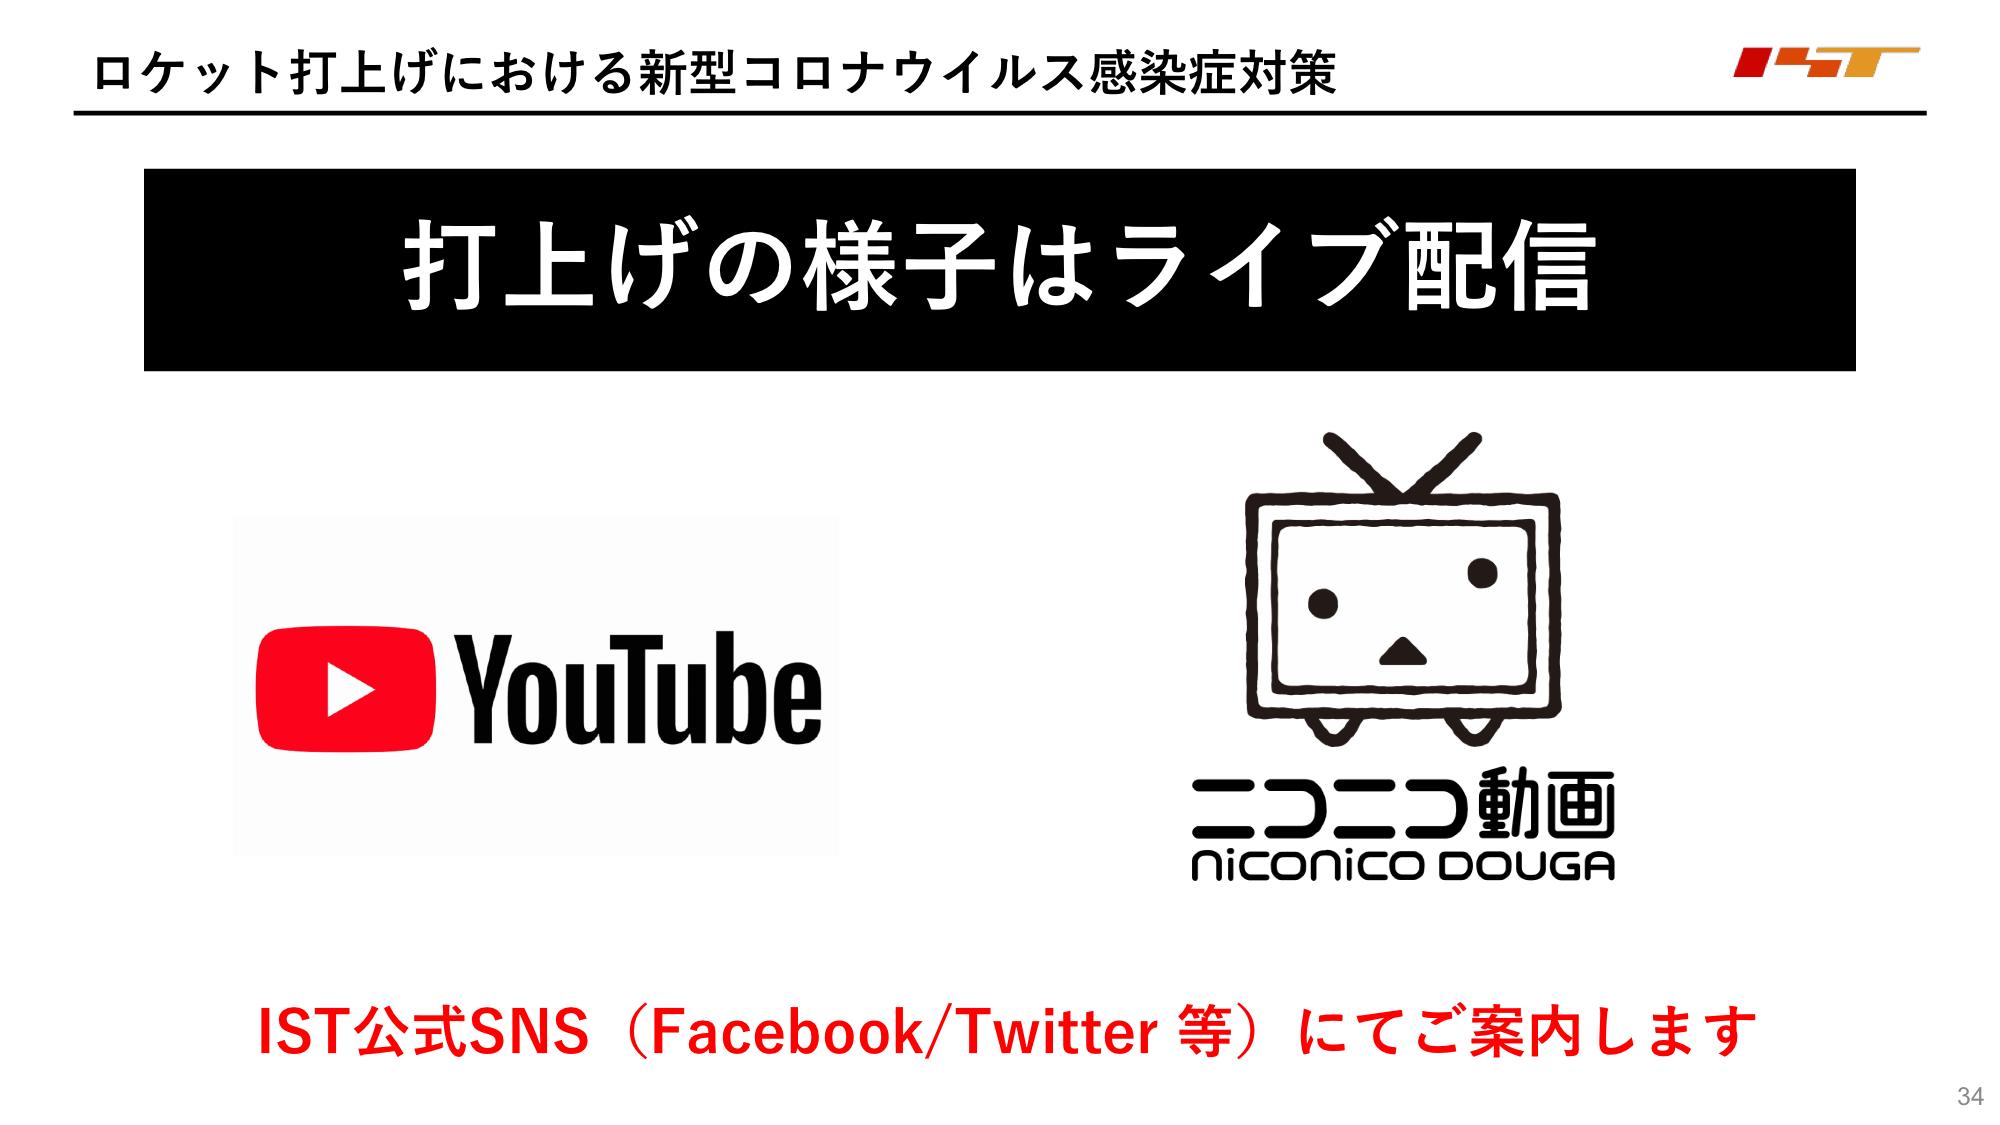 f:id:Imamura:20200603233019p:plain